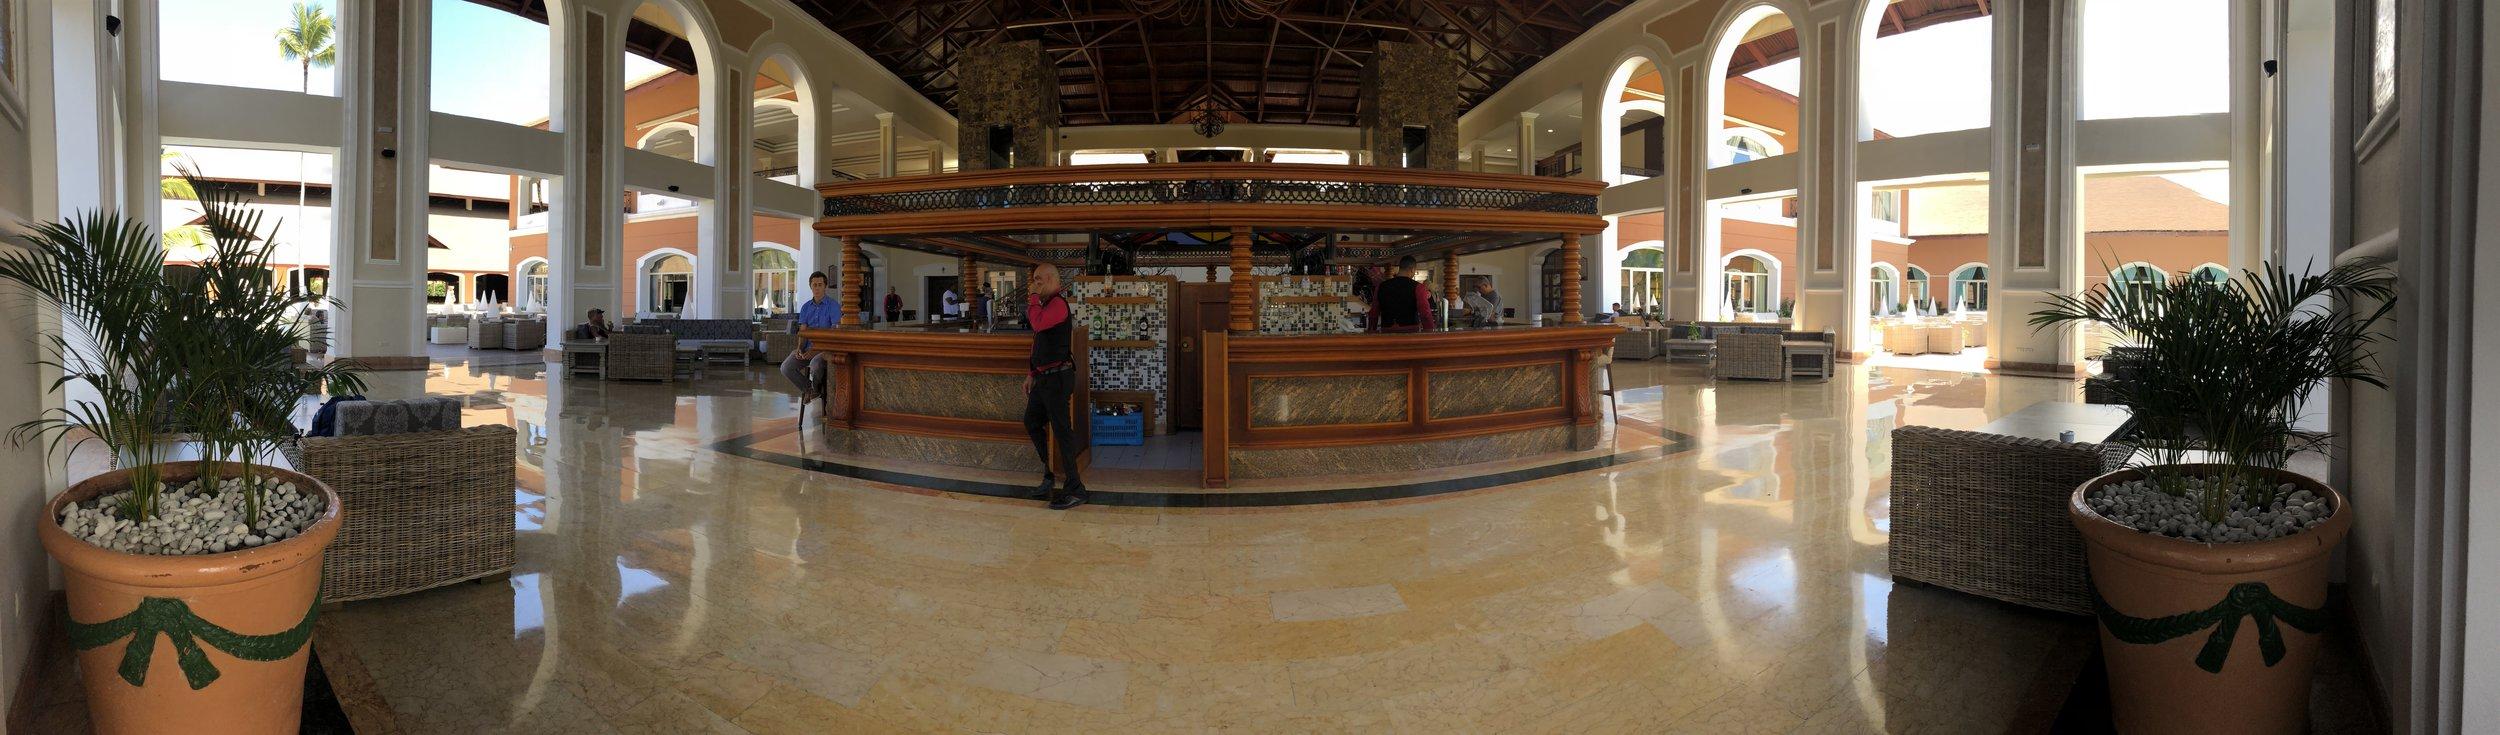 Main lobby bar on the lower level.